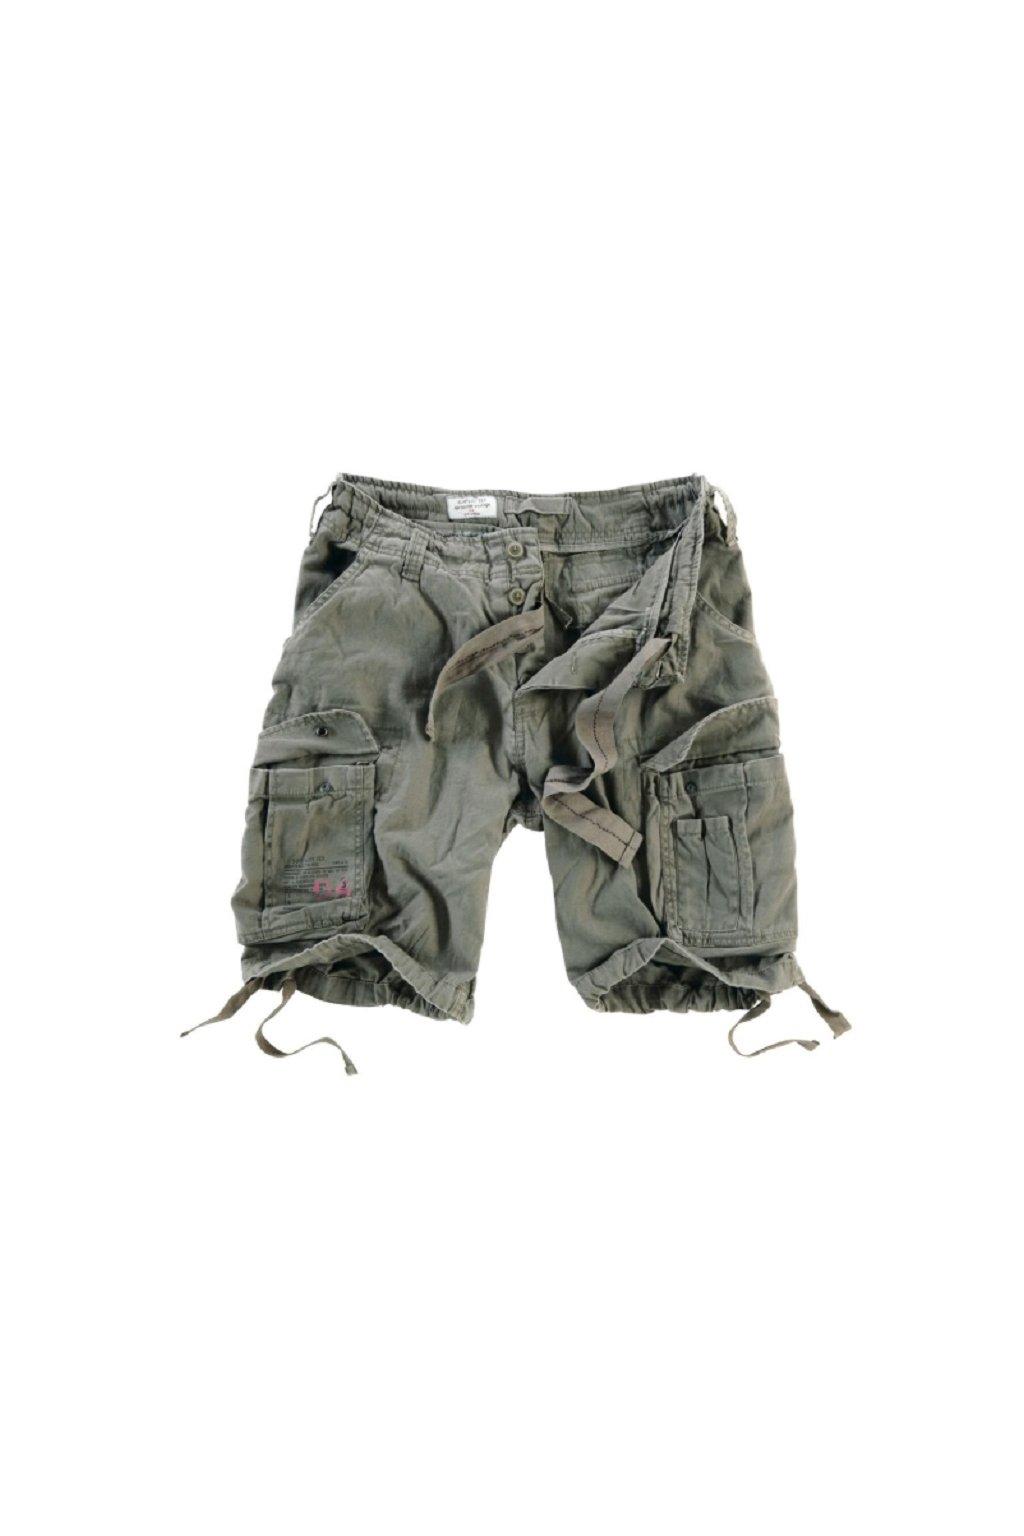 Kraťasy Airborne Vintage Shorts - olivové obr1